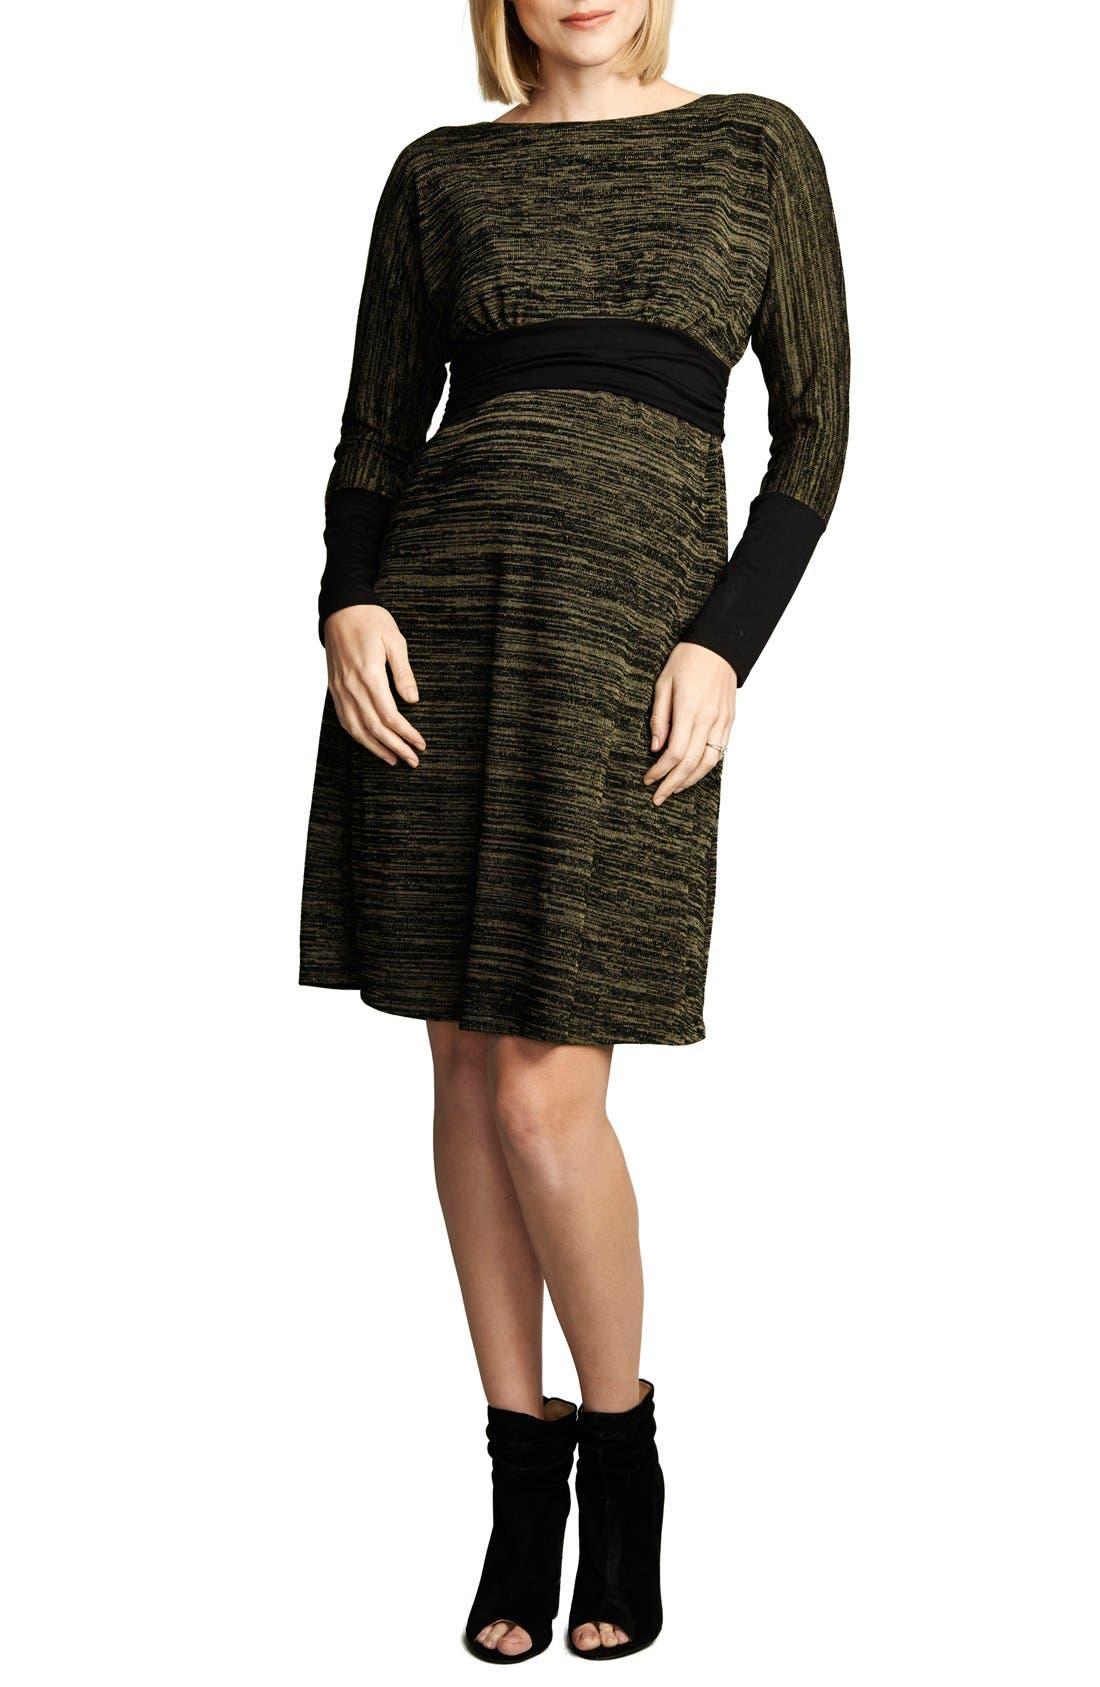 MATERNAL AMERICA,                             Empire WaistNursing Dress,                             Main thumbnail 1, color,                             OLIVE SPACE DYE